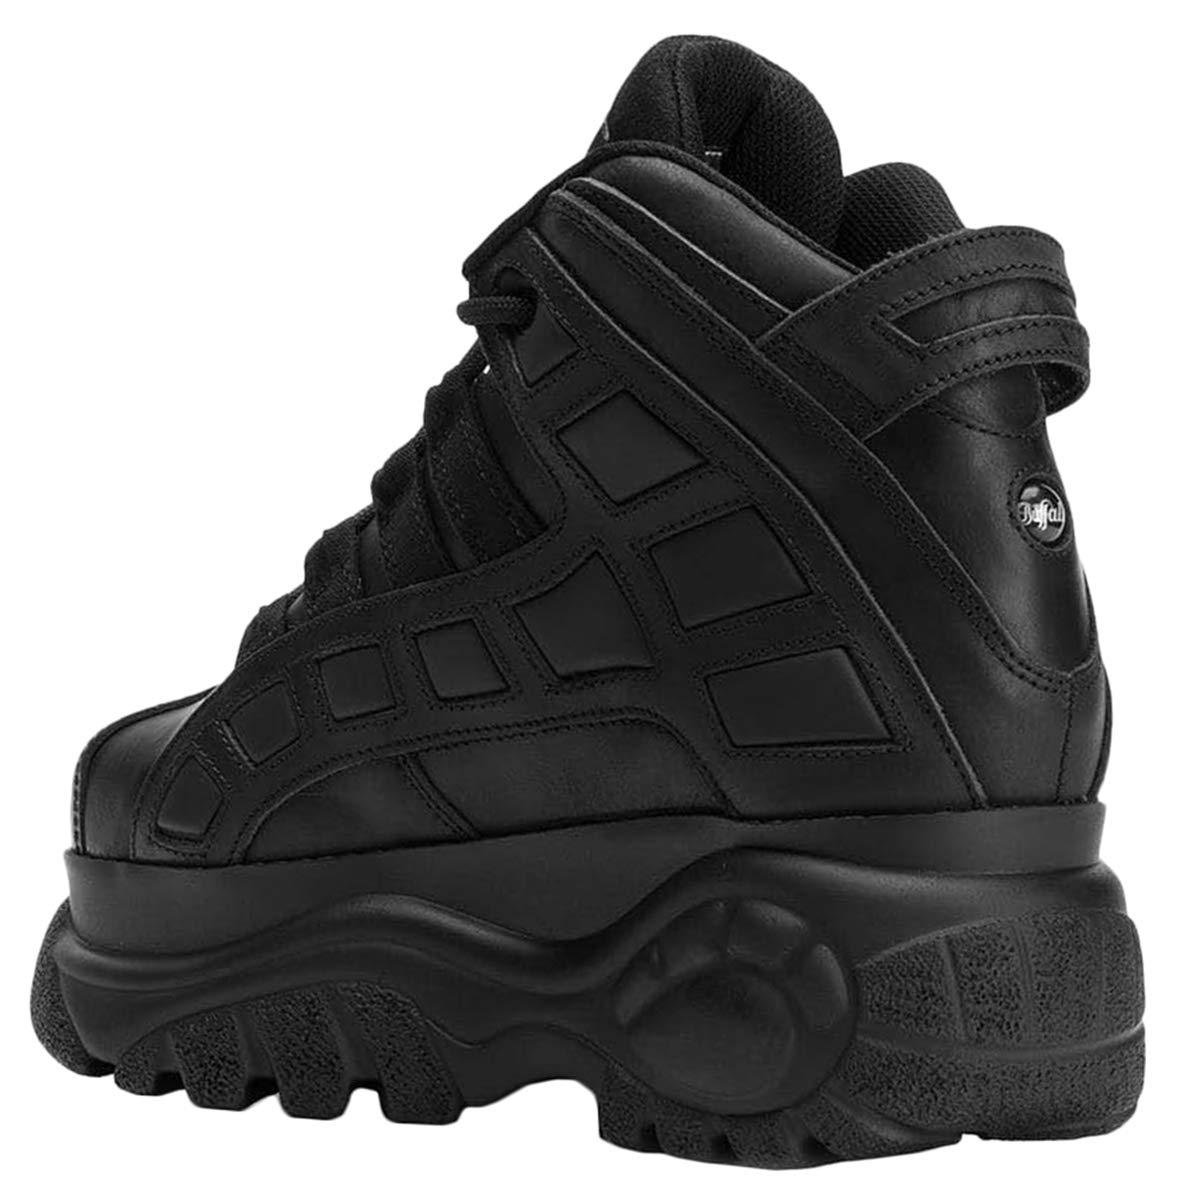 Boots Classic Black 14 Leather London Plateau Buffalo 2003 3jRA54L